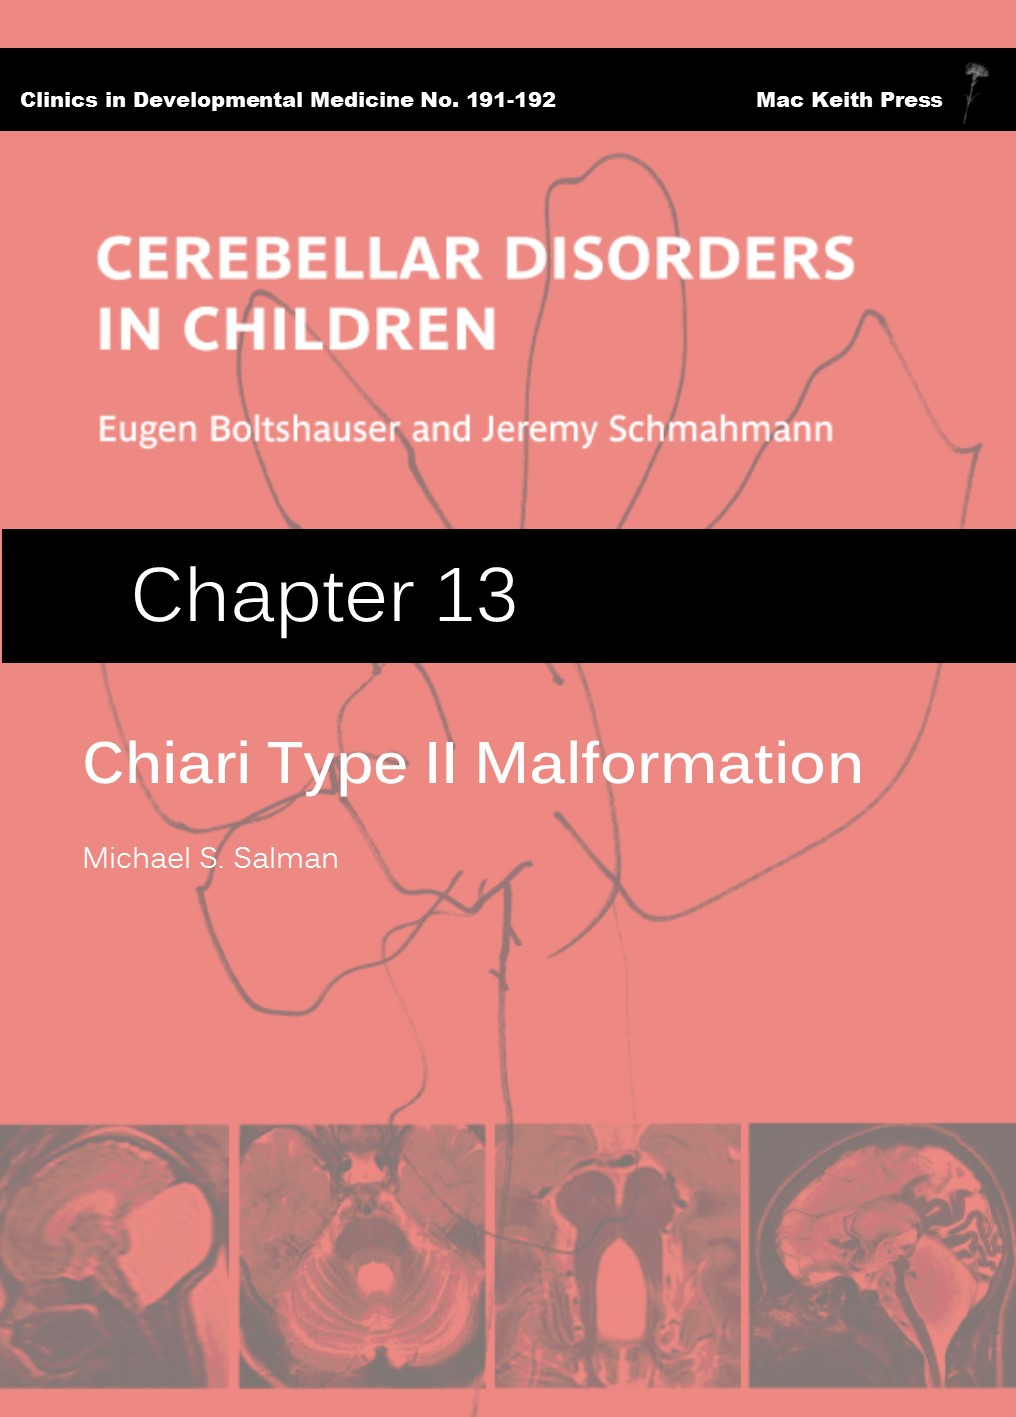 Chiari Type II Malformation - Cerebellar Disorders in Children (Chapter 13)